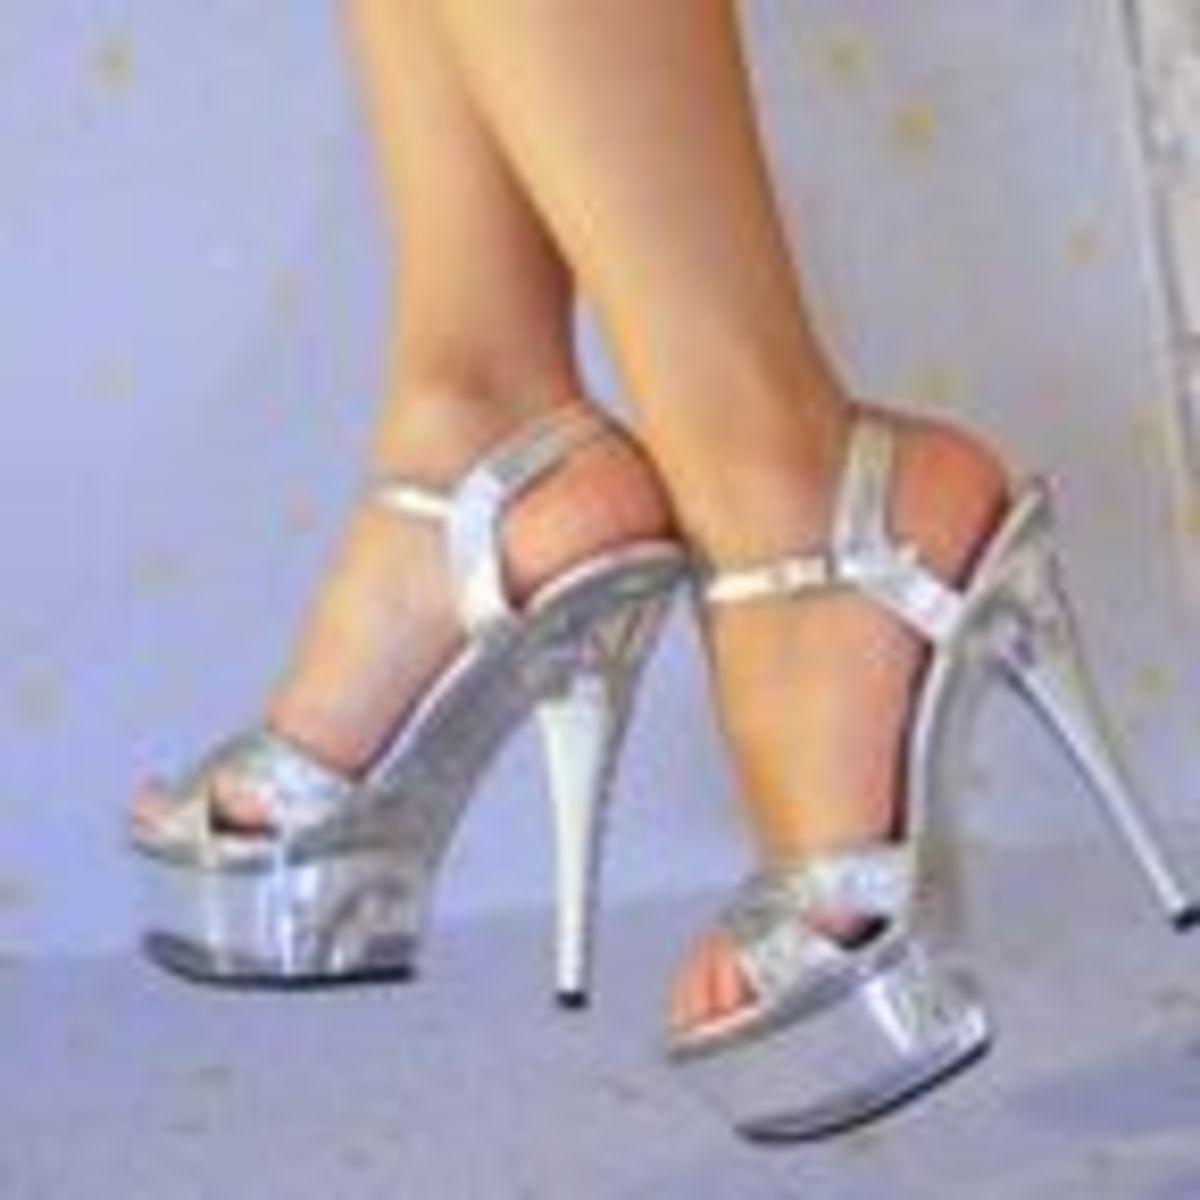 Sexy women fetish legs sandles